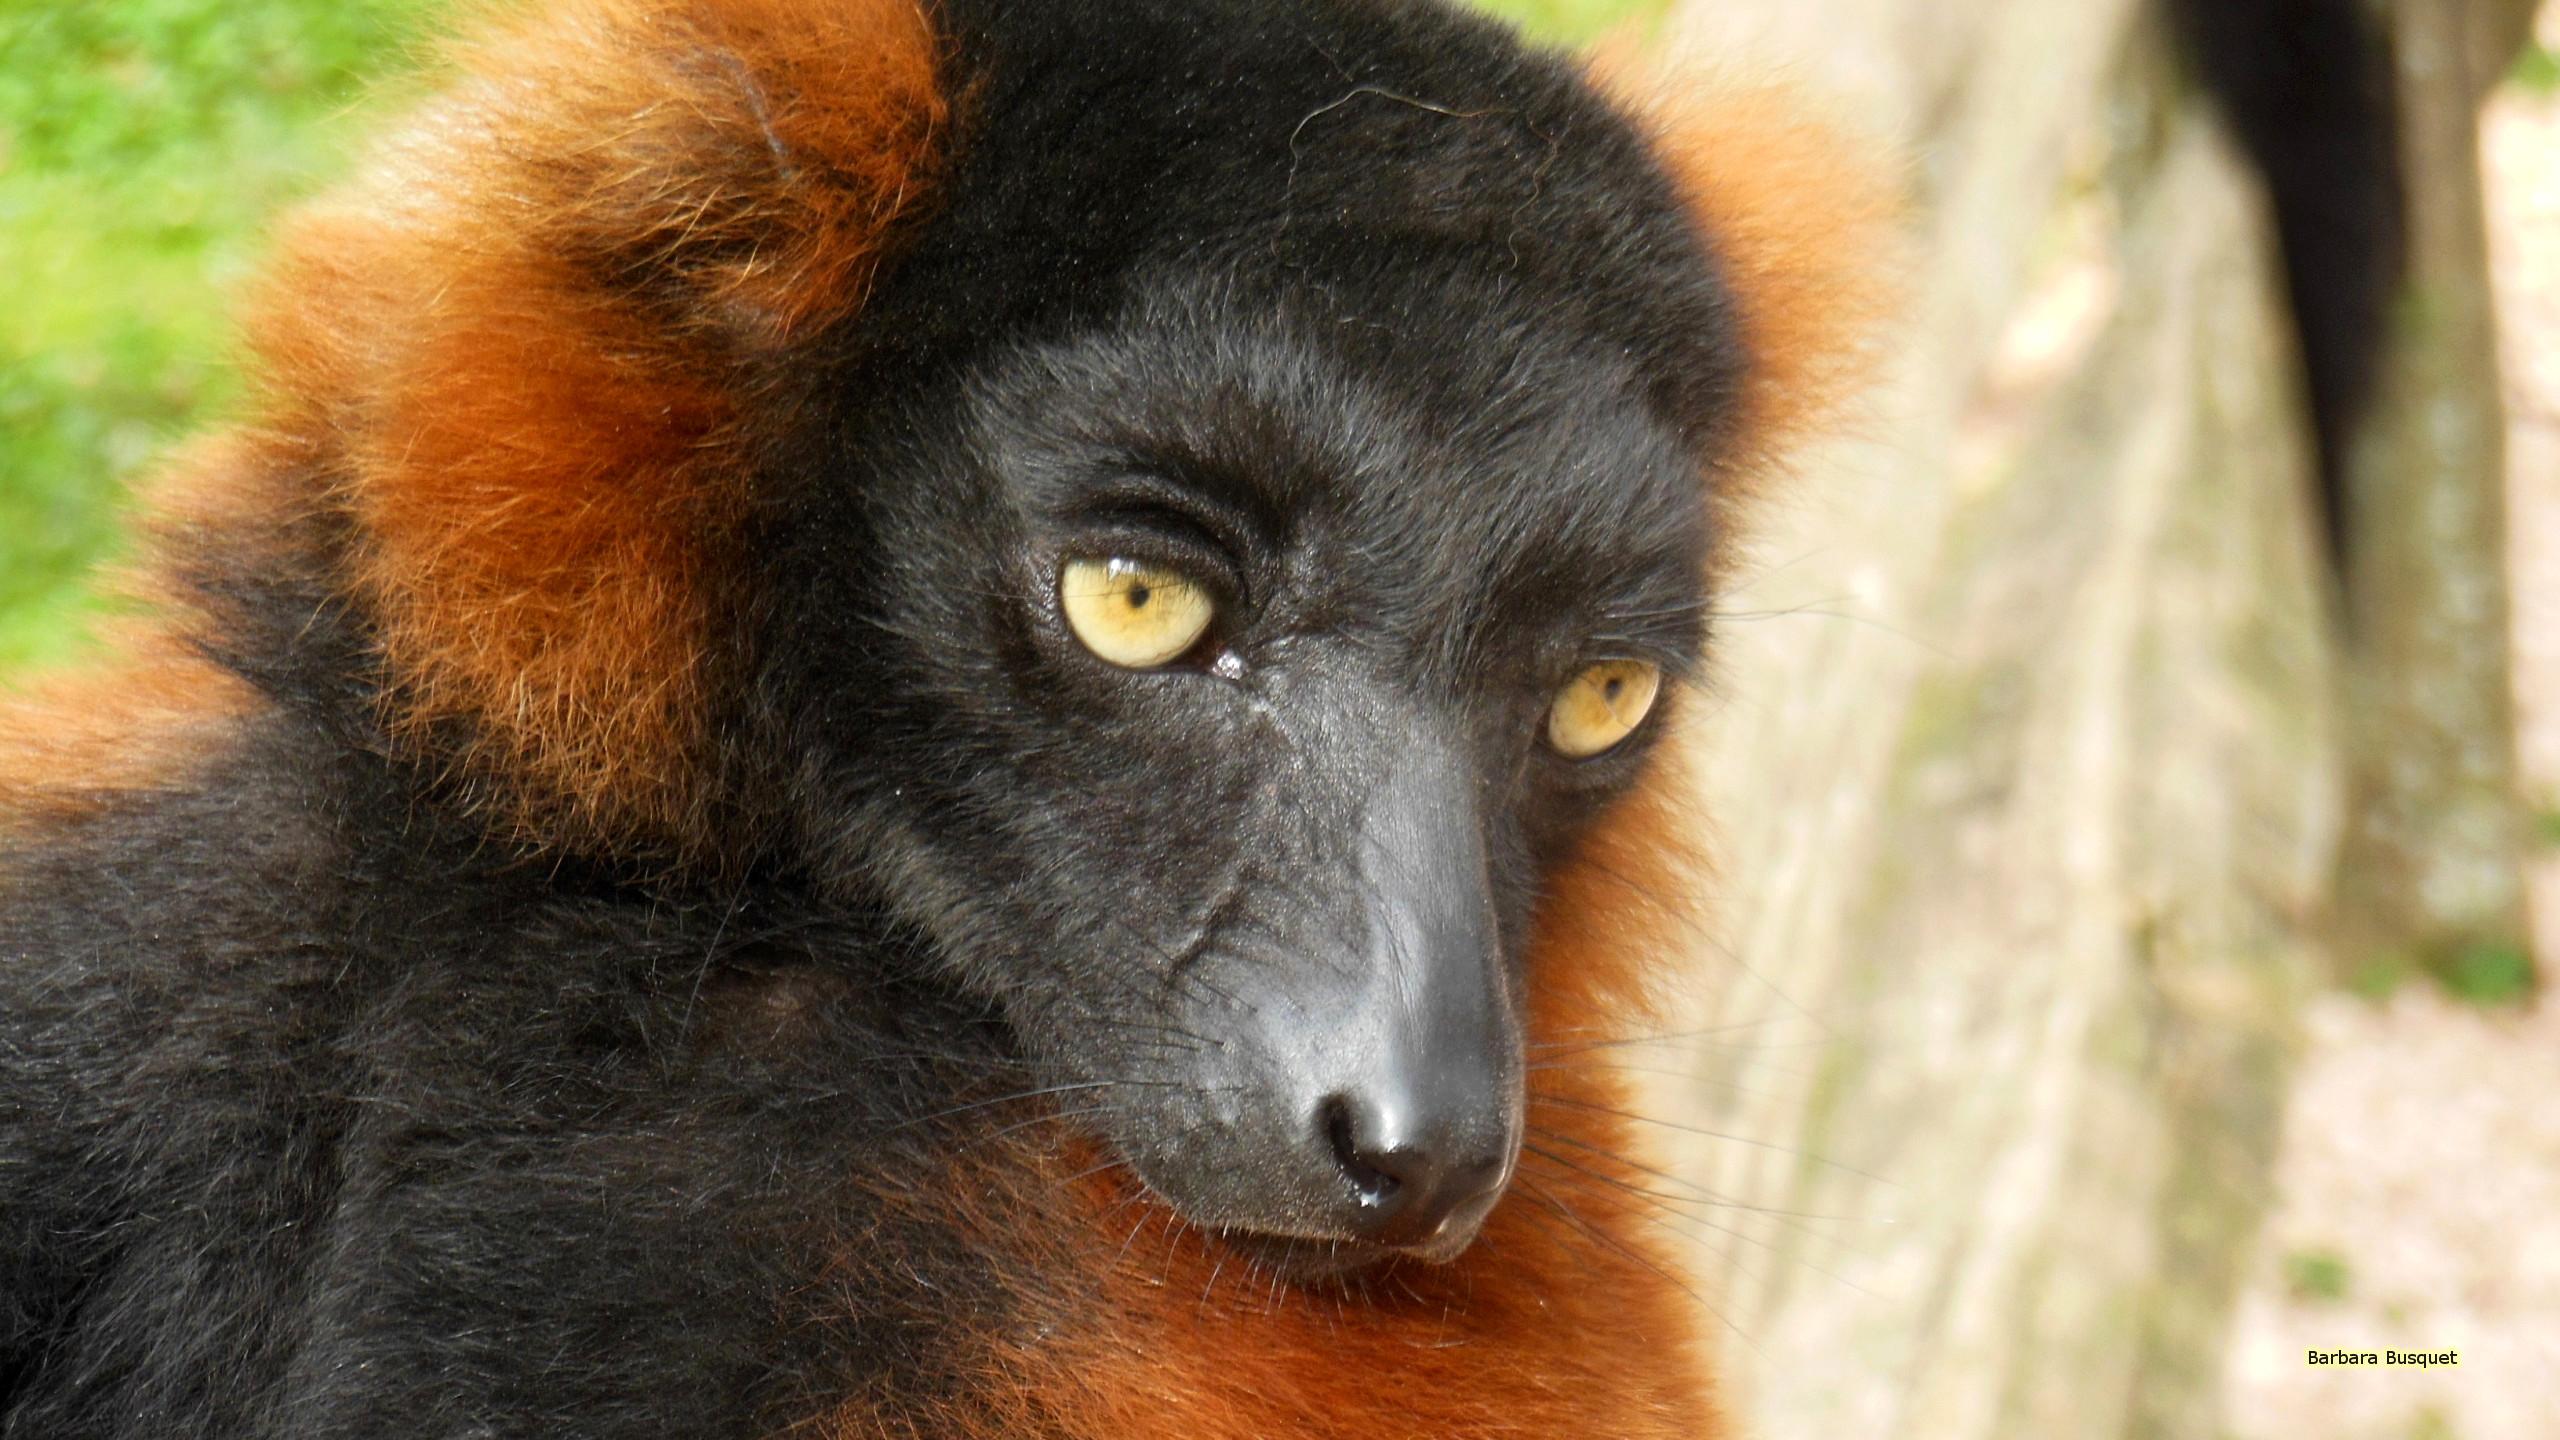 Good Lemur Wallpaper - HD-wallpaper-red-ruffed-lemur  You Should Have_5715.jpg